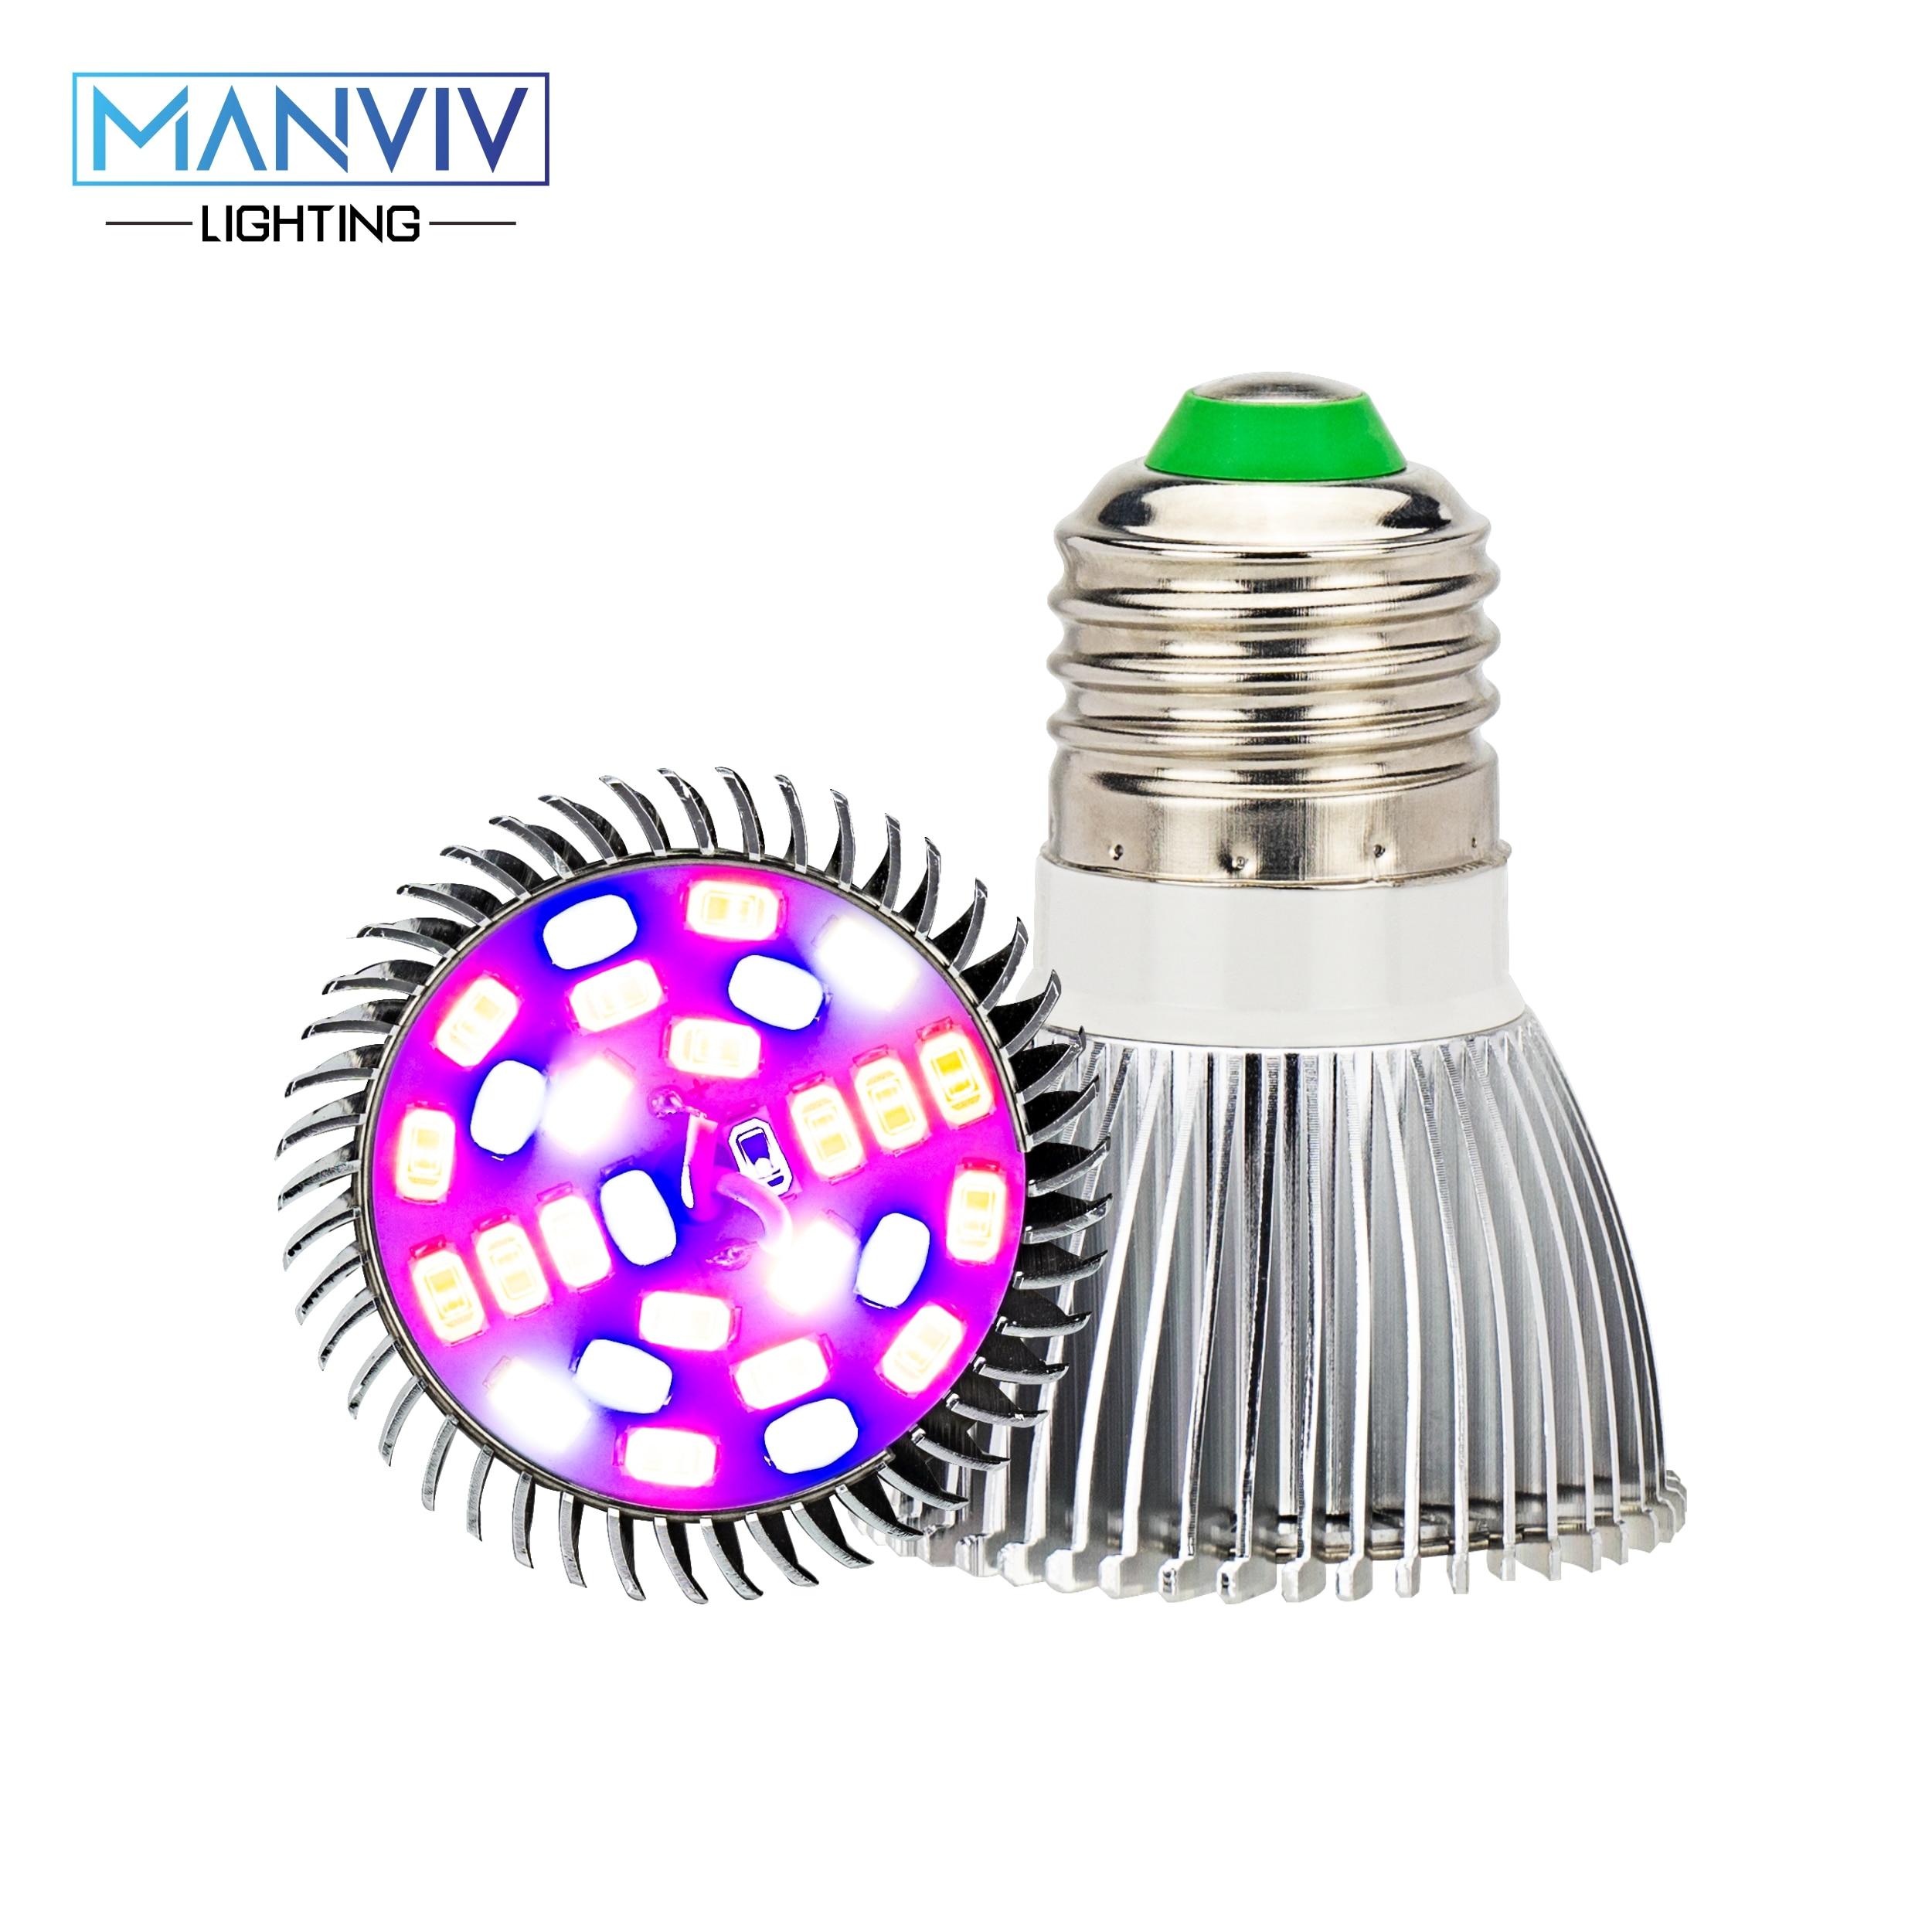 LED Grow Lamp 5W 10W 30W 50W 80W AC85-265V Full Spectrum E27 LED Grow Light Bulb DIY For Garden Plants Flower Hydroponics Growth